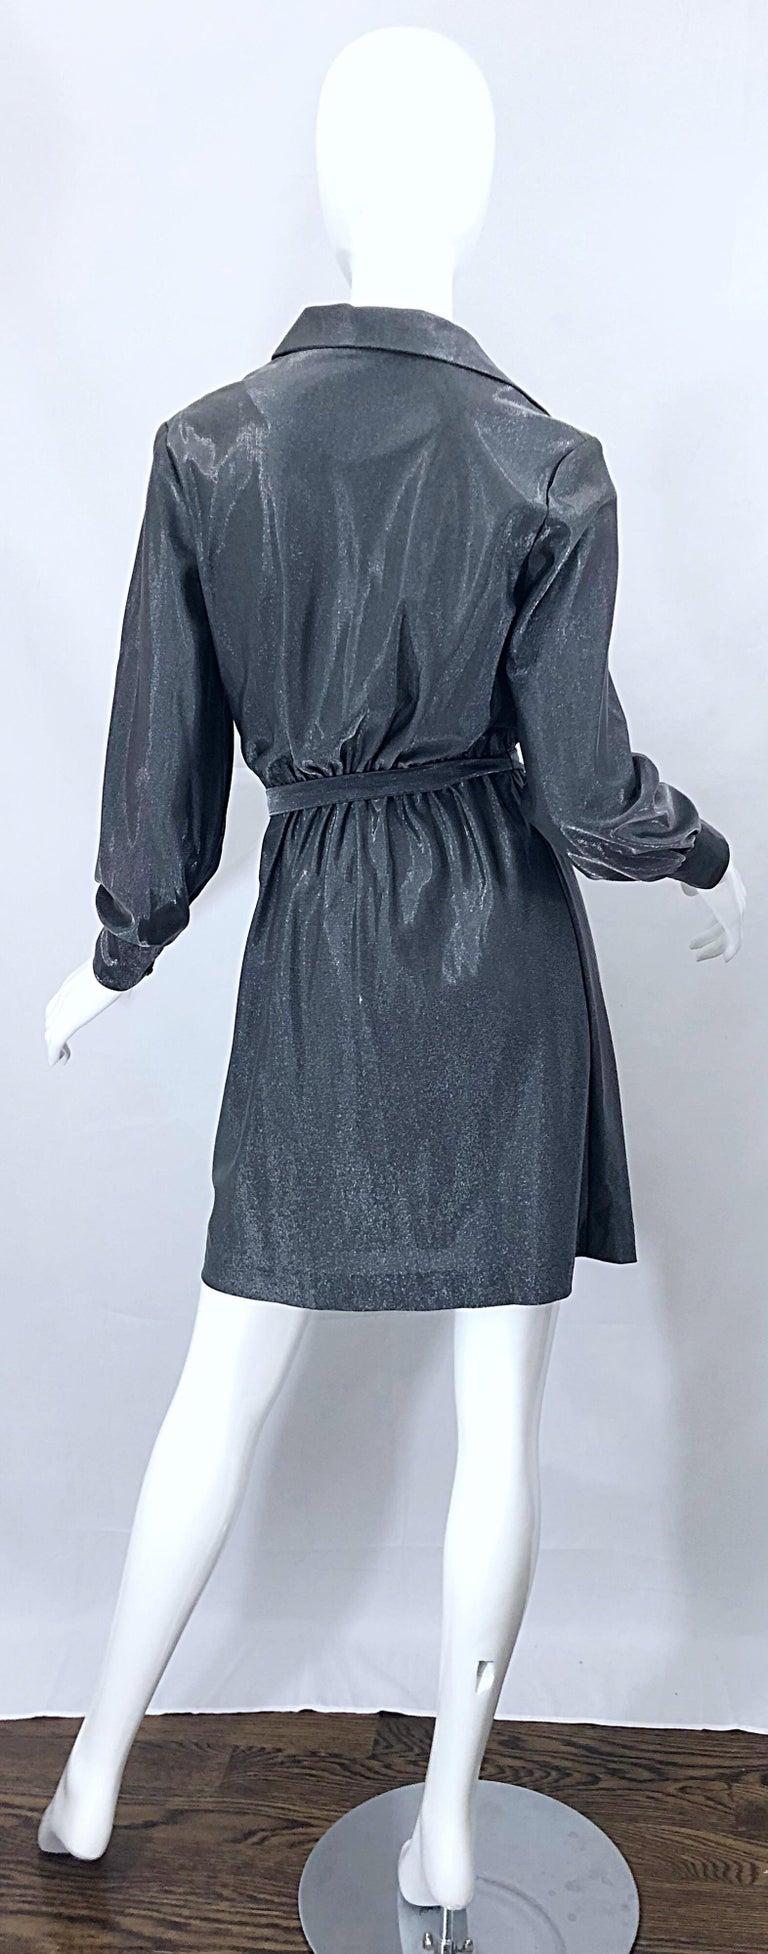 1970s Gunmetal Metallic Silver Gray Belted Vintage 70s Long Sleeve Shirt Dress For Sale 1